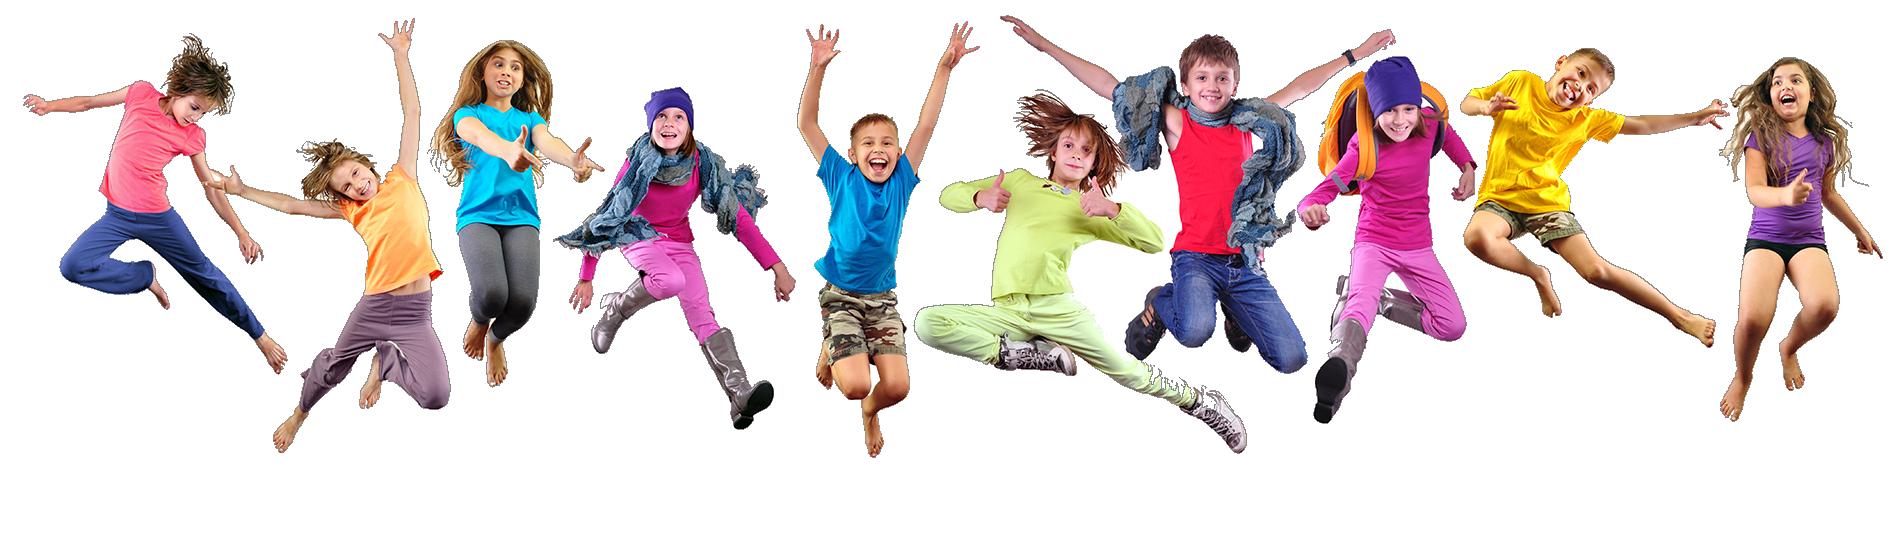 baile-niños-escuela-de-baile